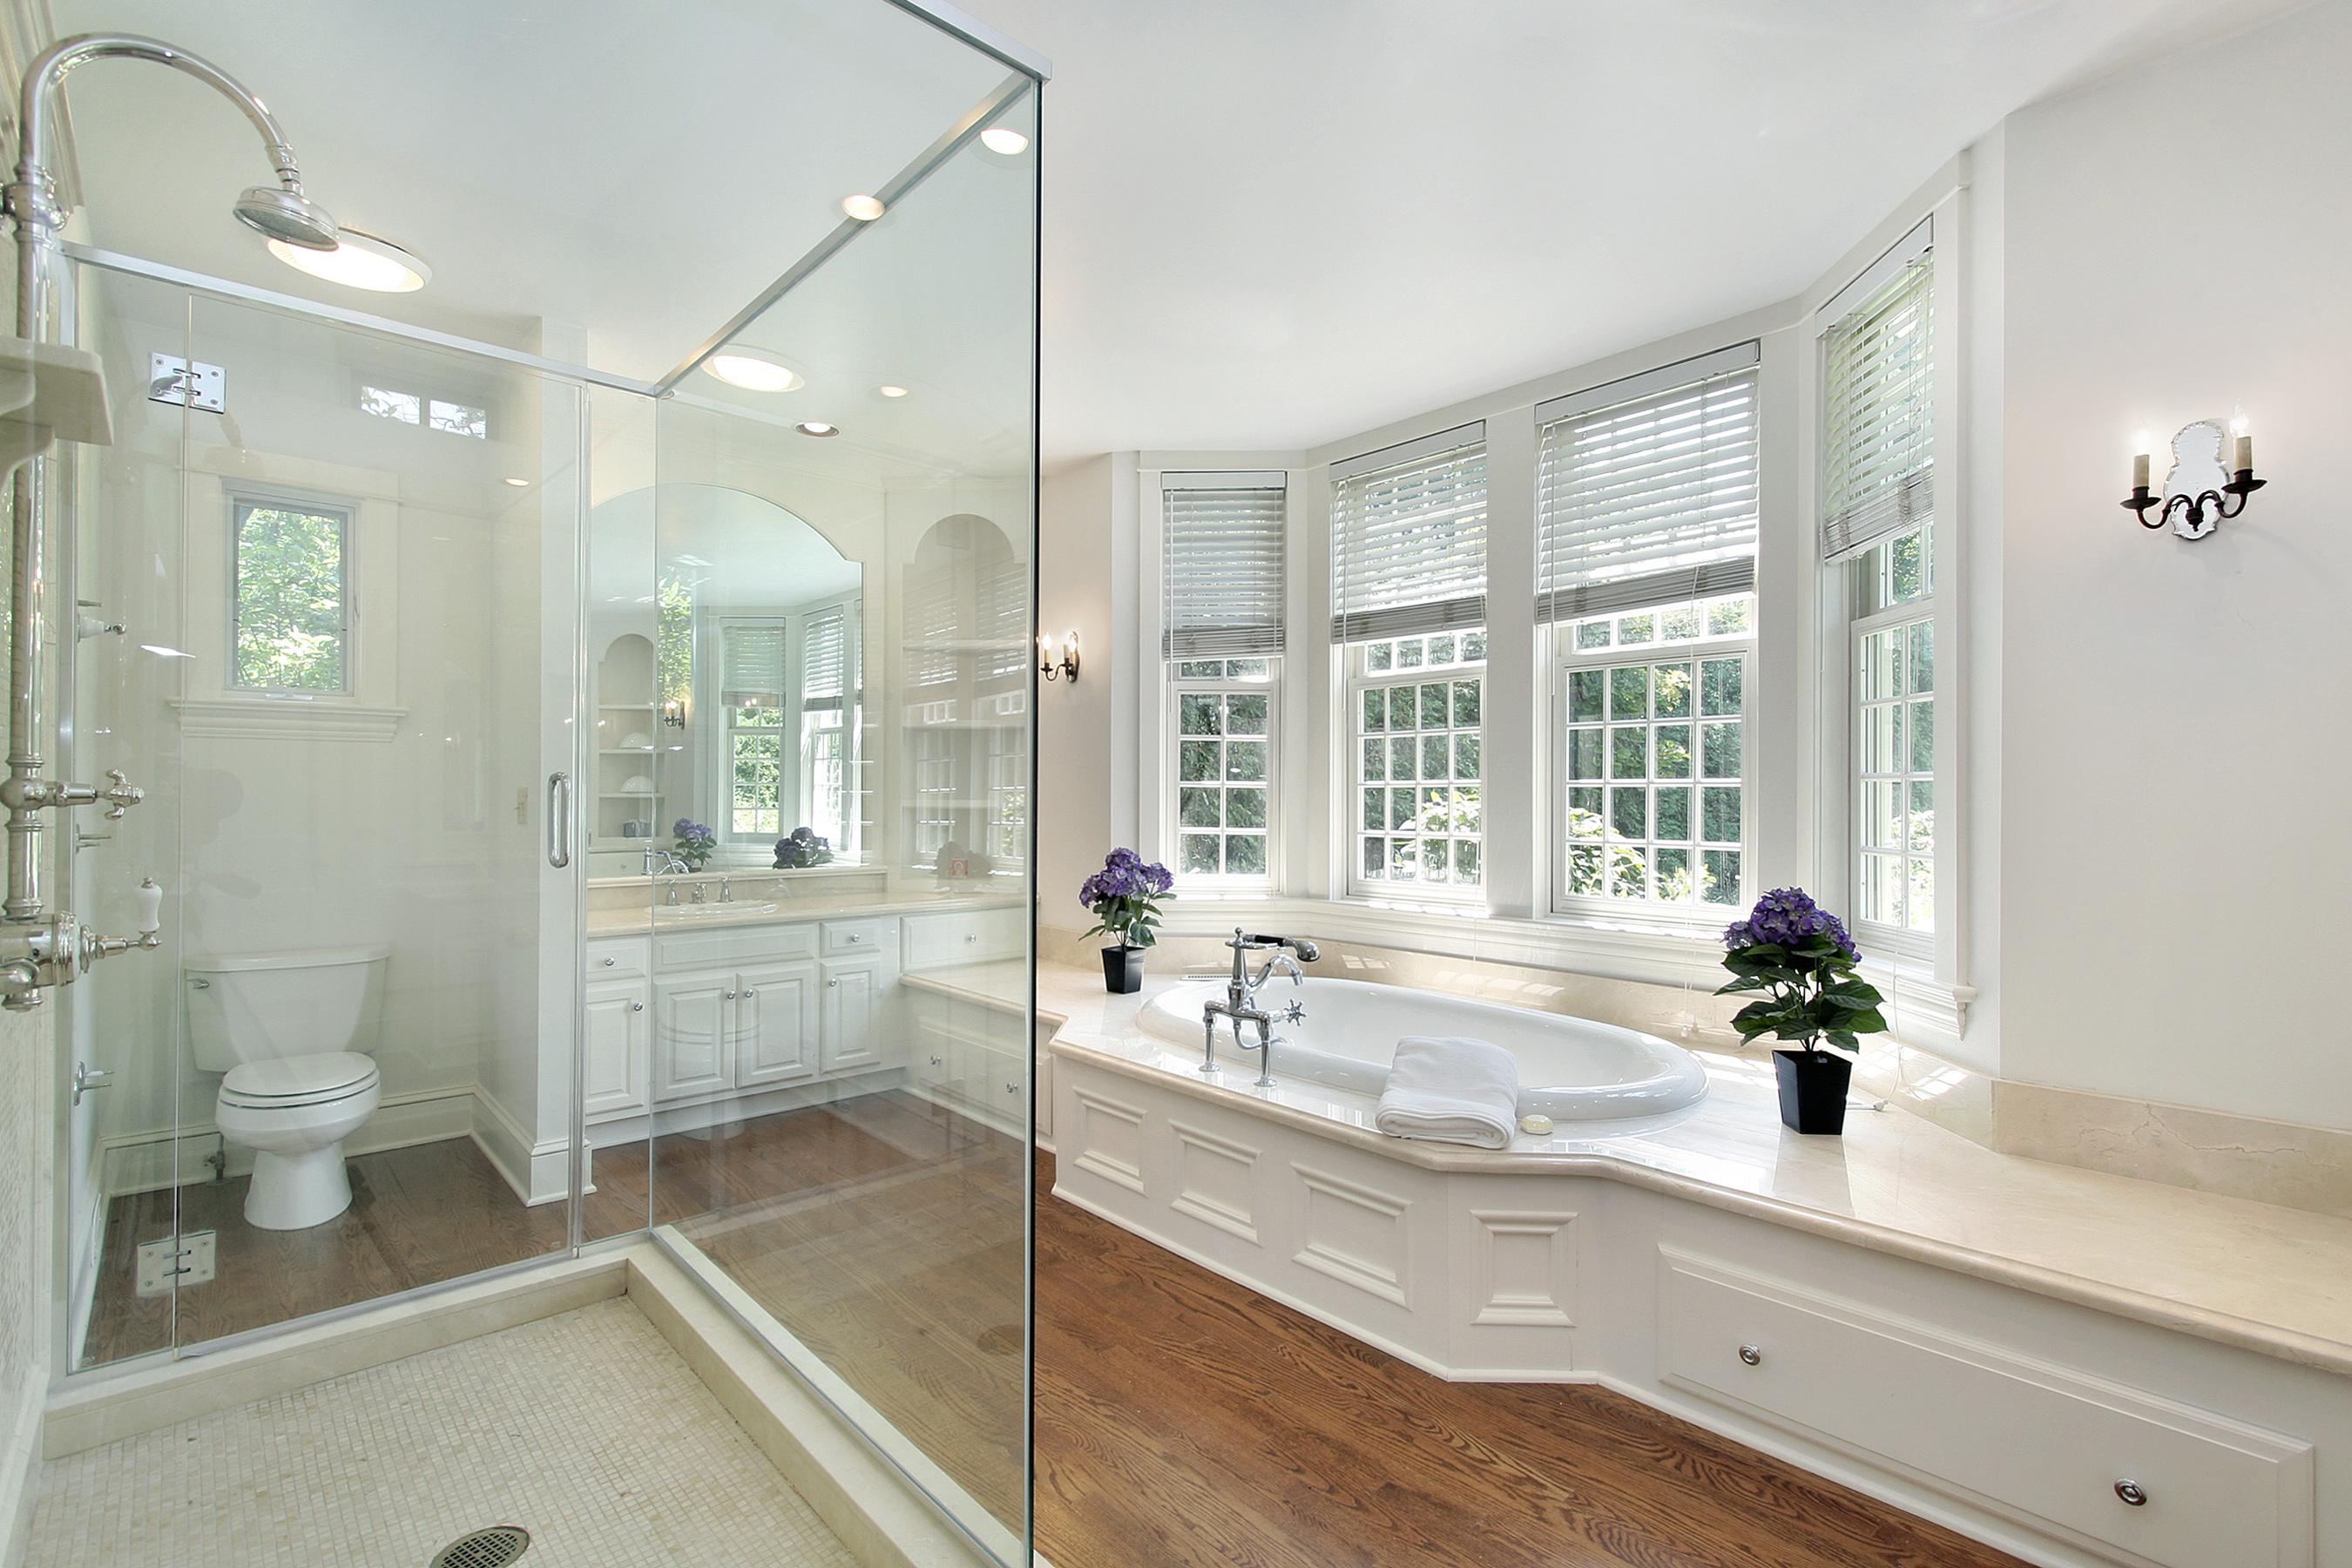 Bethesda Maryland Master Suite Remodeling: Bradley Construction Inc. Home